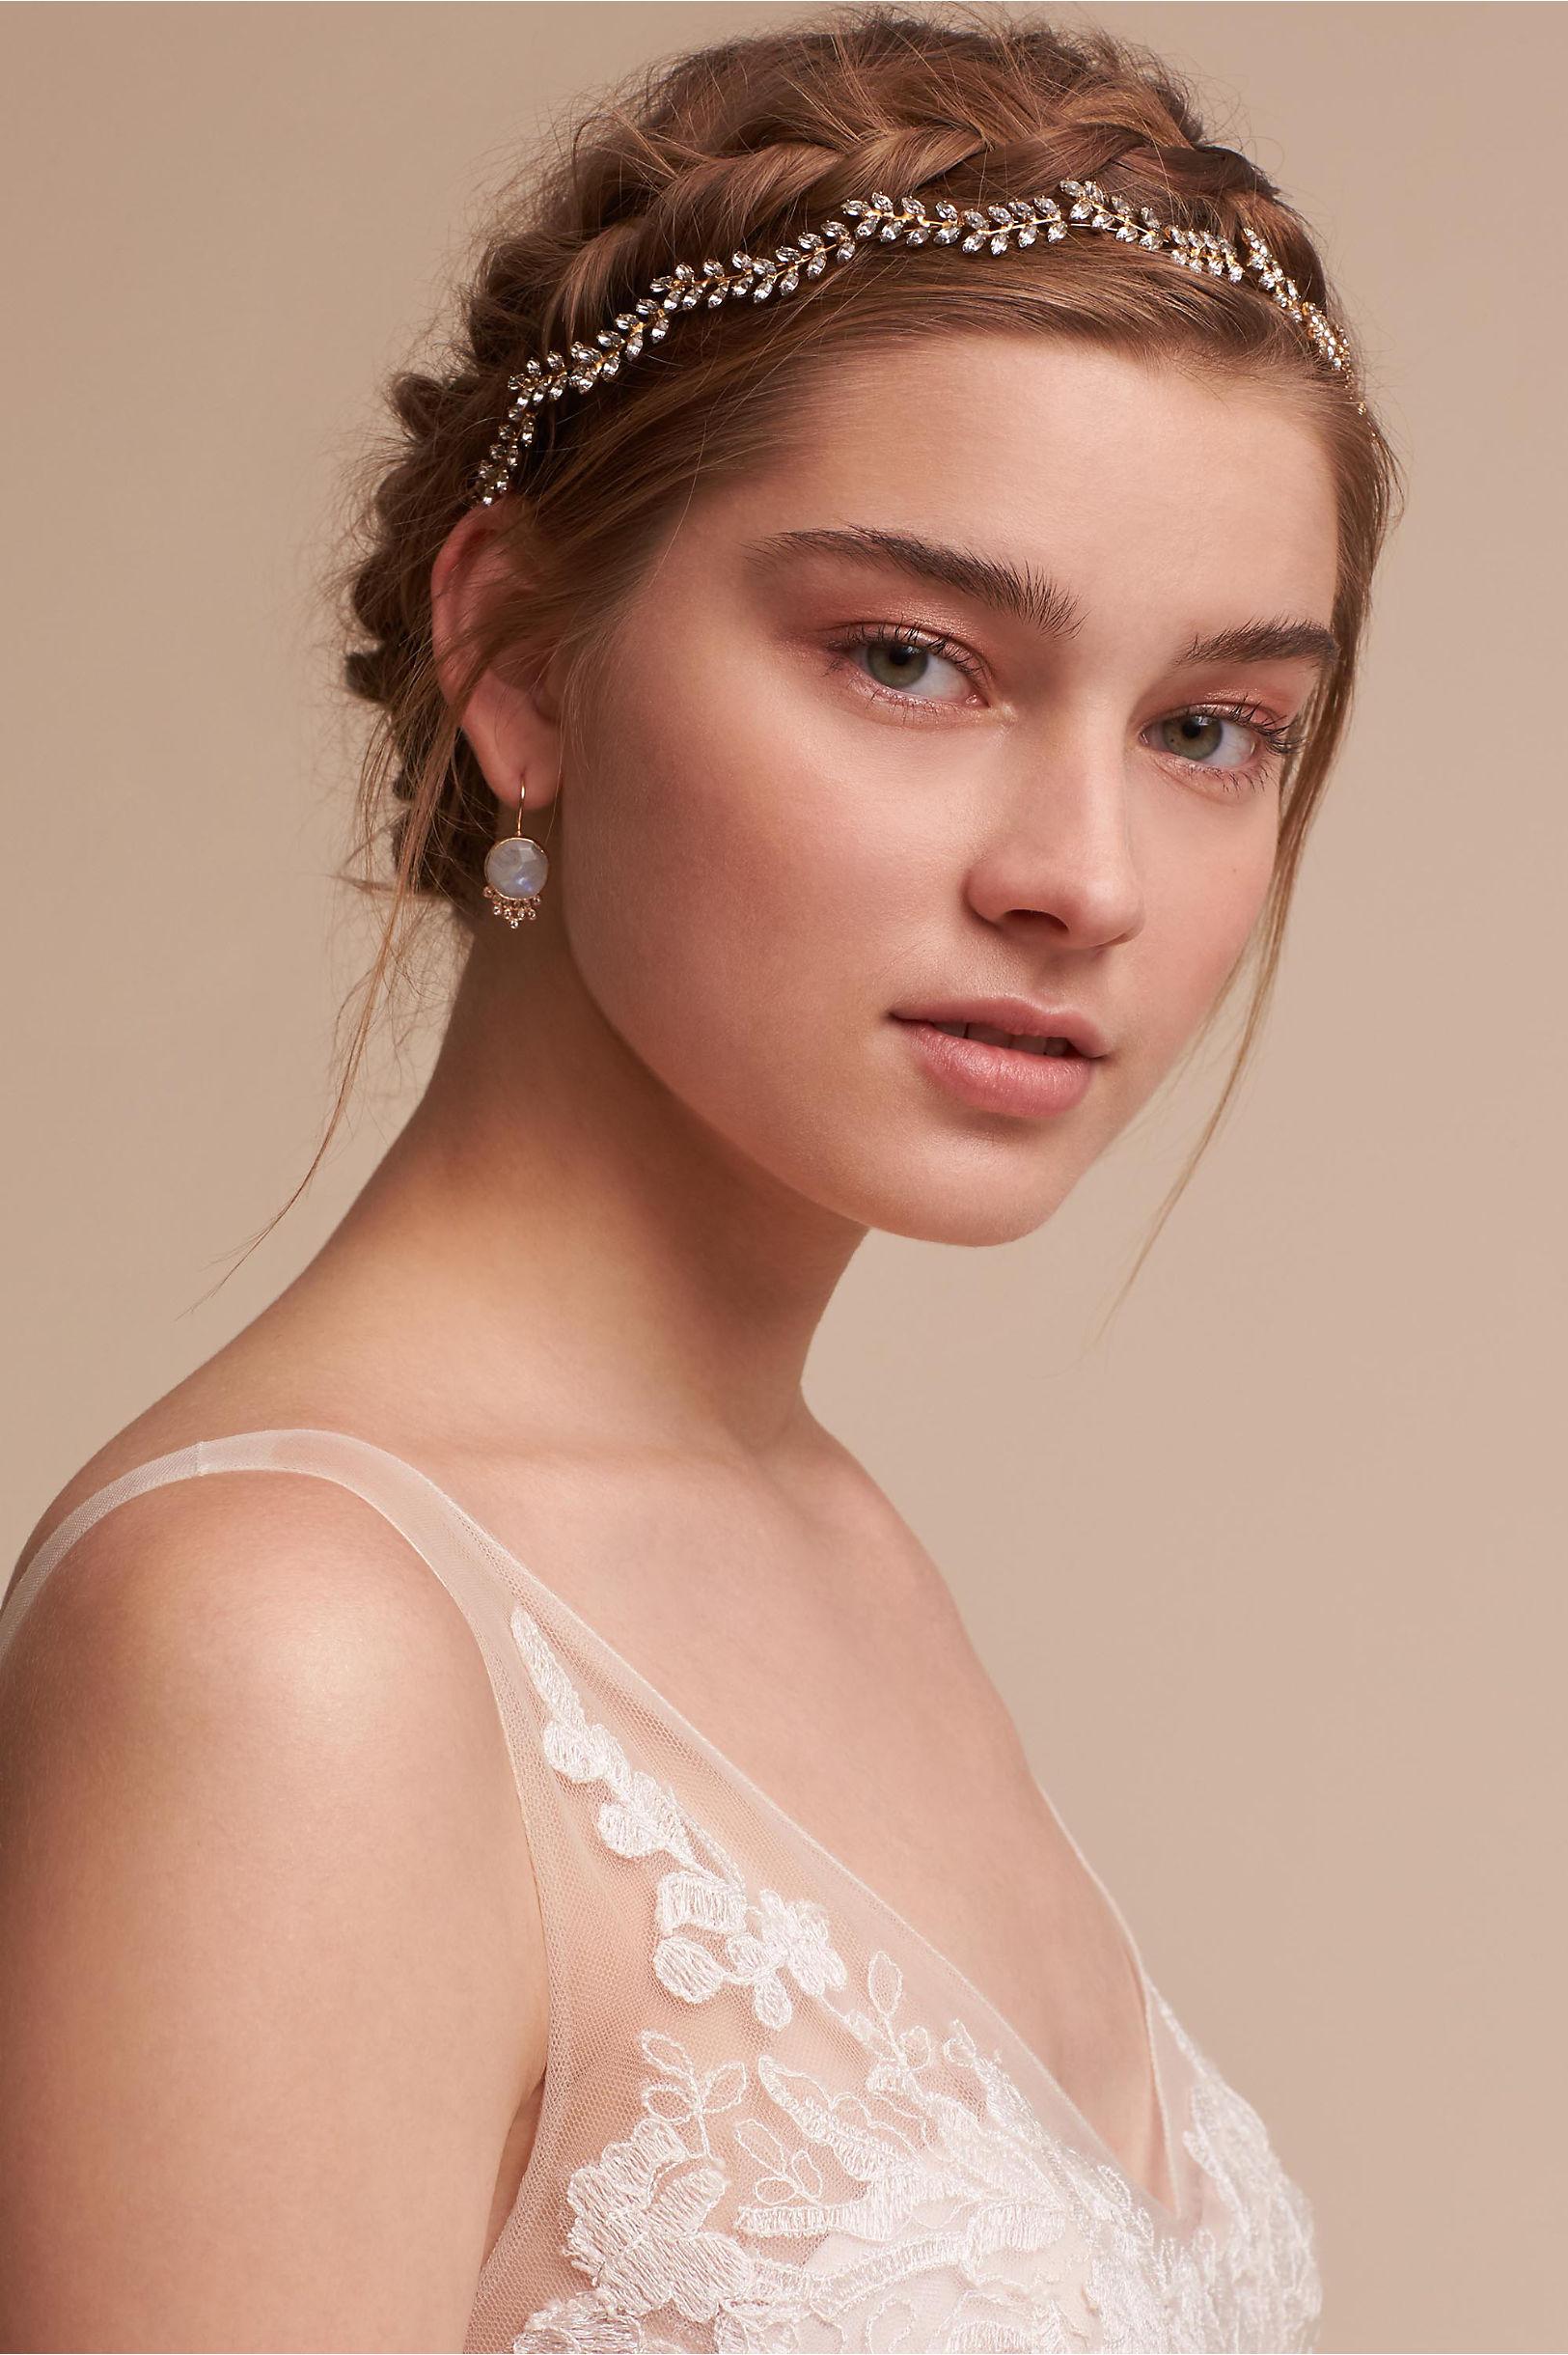 Bridal hair accessories for long hair - Blossoming Vine Headband